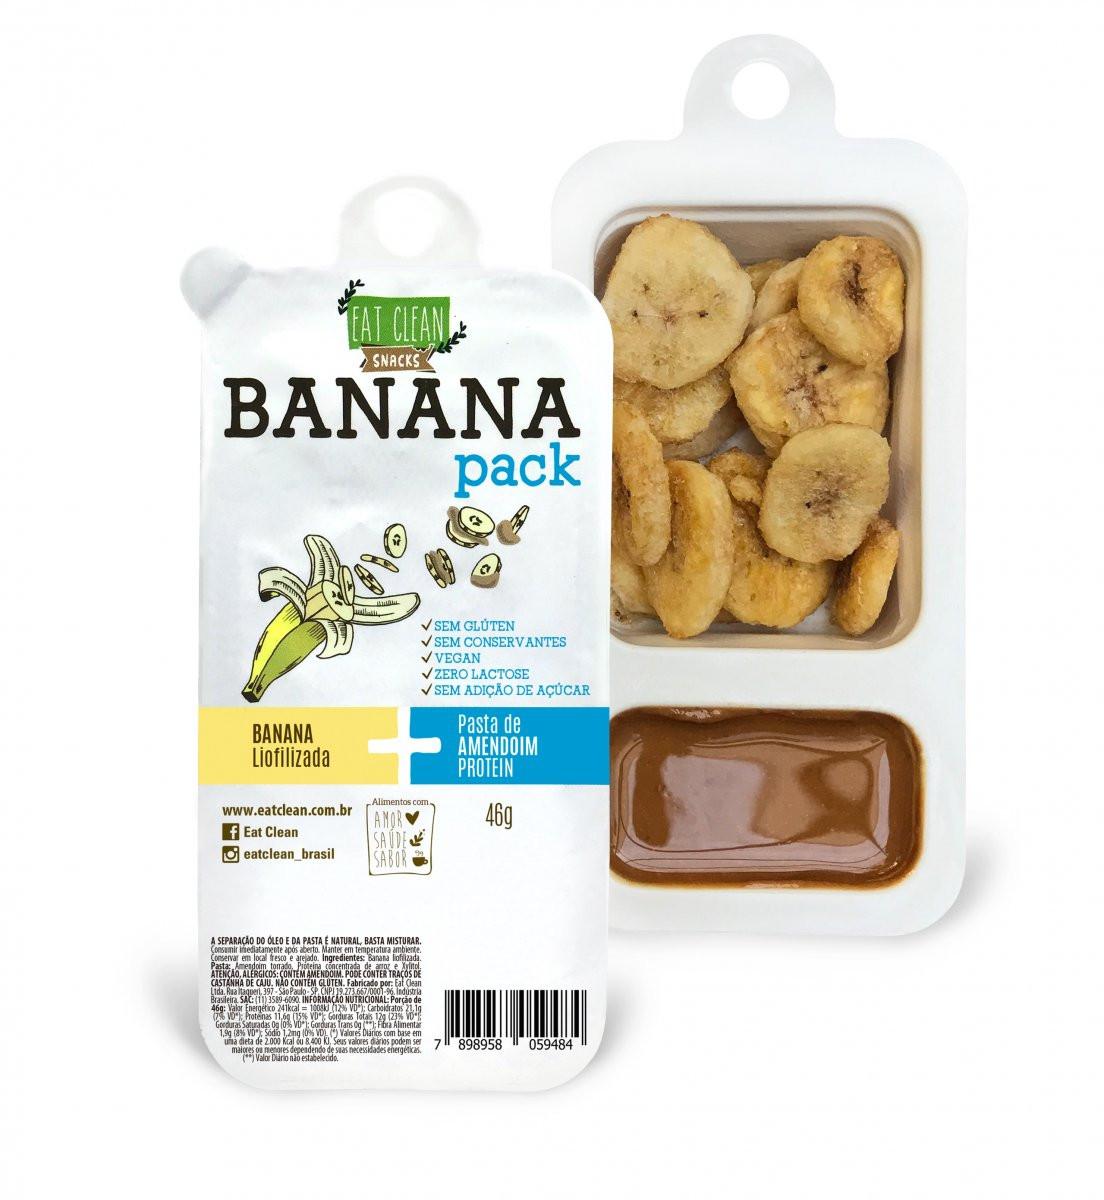 Banana Pack Protein Amendoim Protein (46) Eat Clean